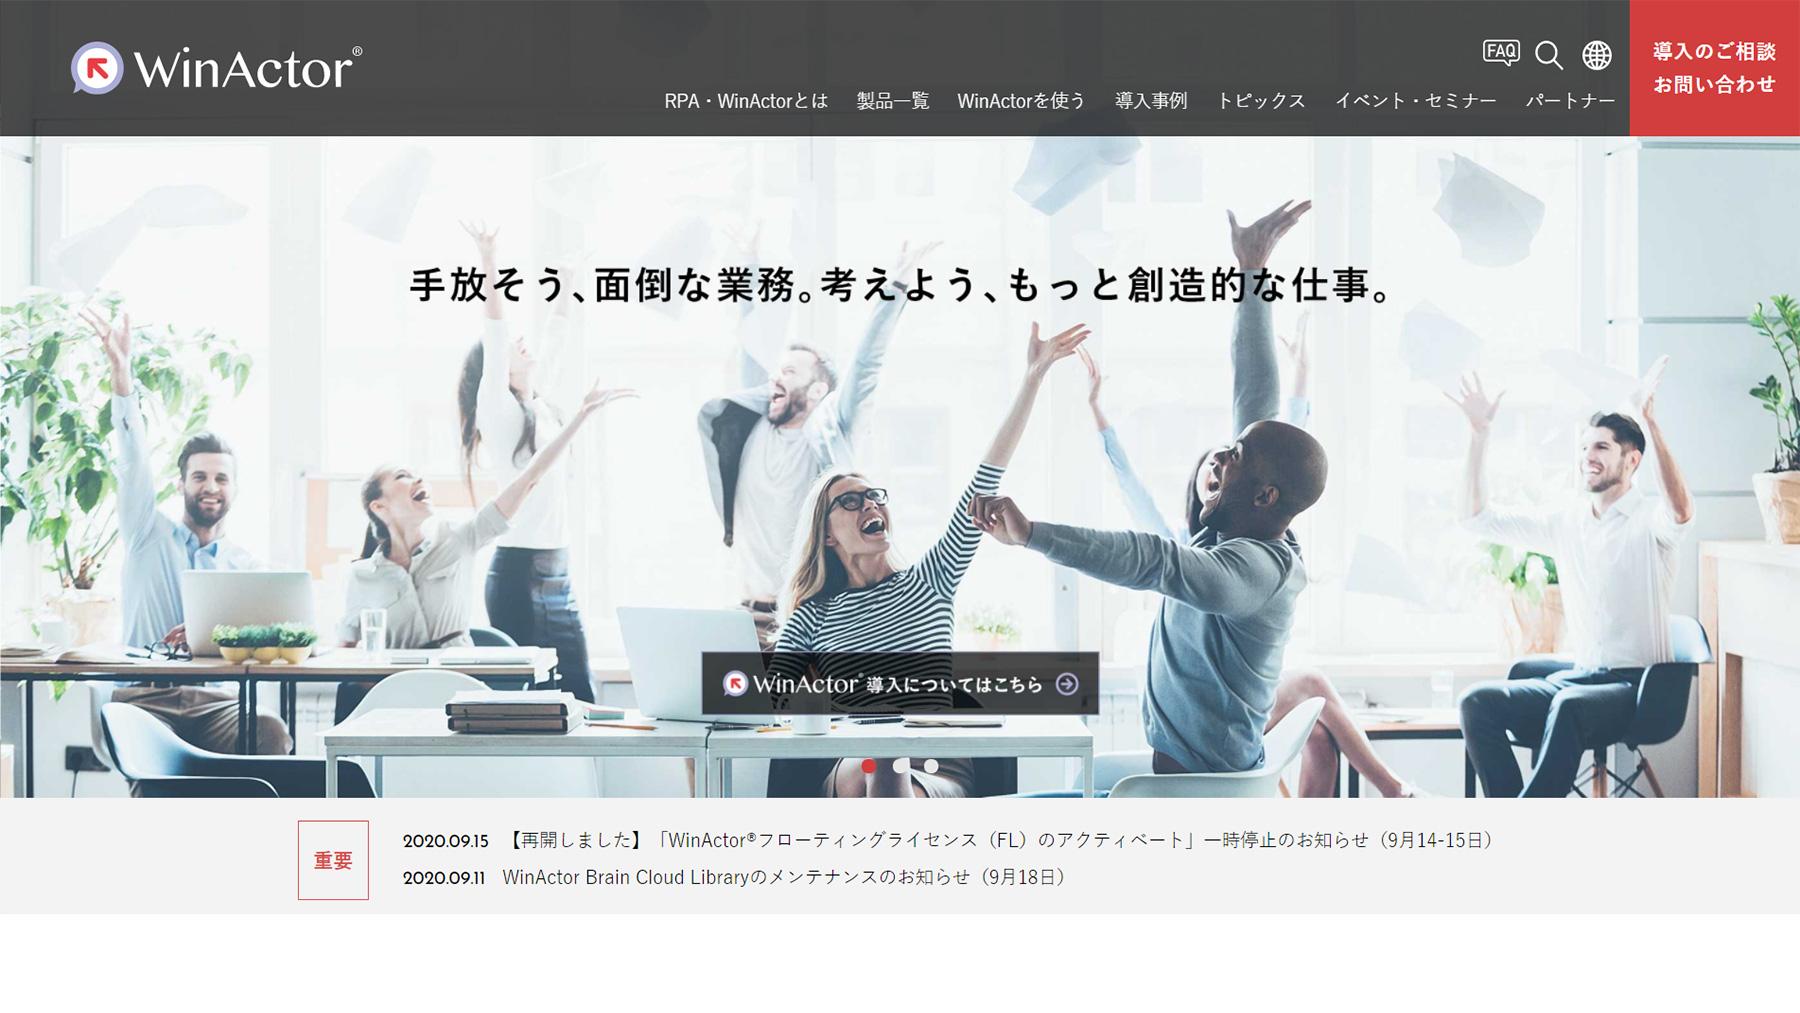 WinActor公式Webサイト